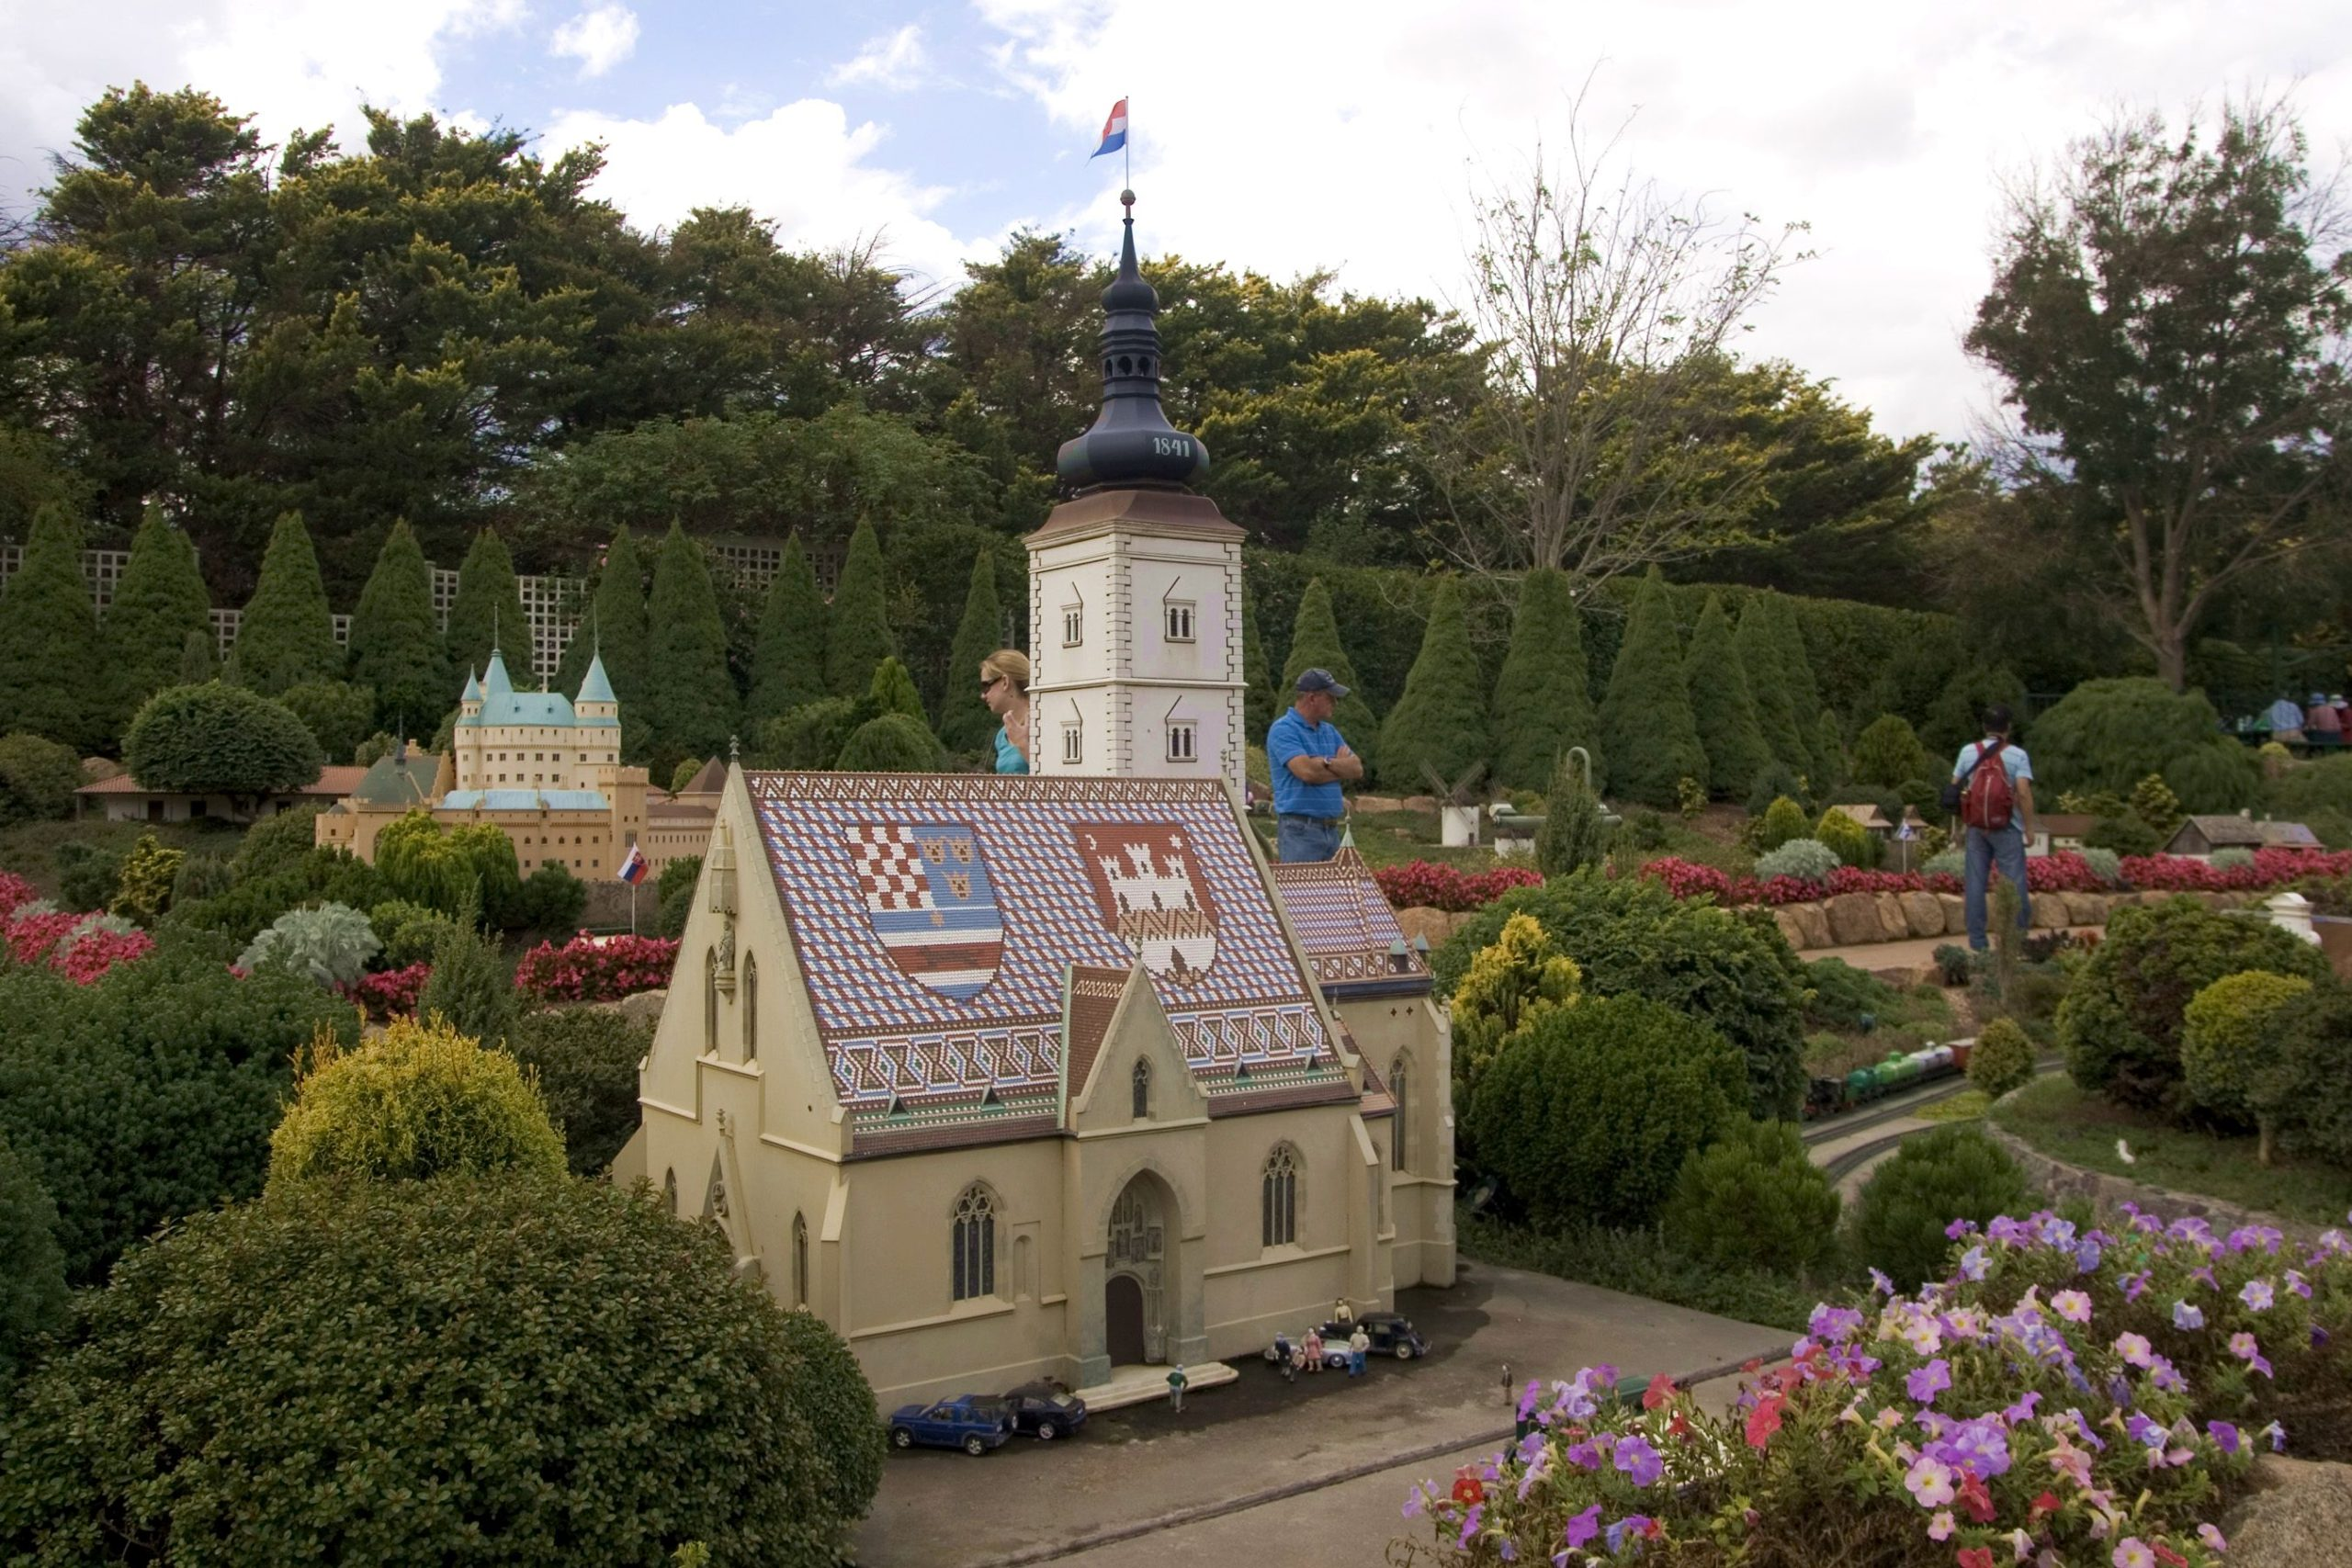 The replica of St. Mark's church in the Australian miniature village (photo: Maksym Kozlenko under CC)